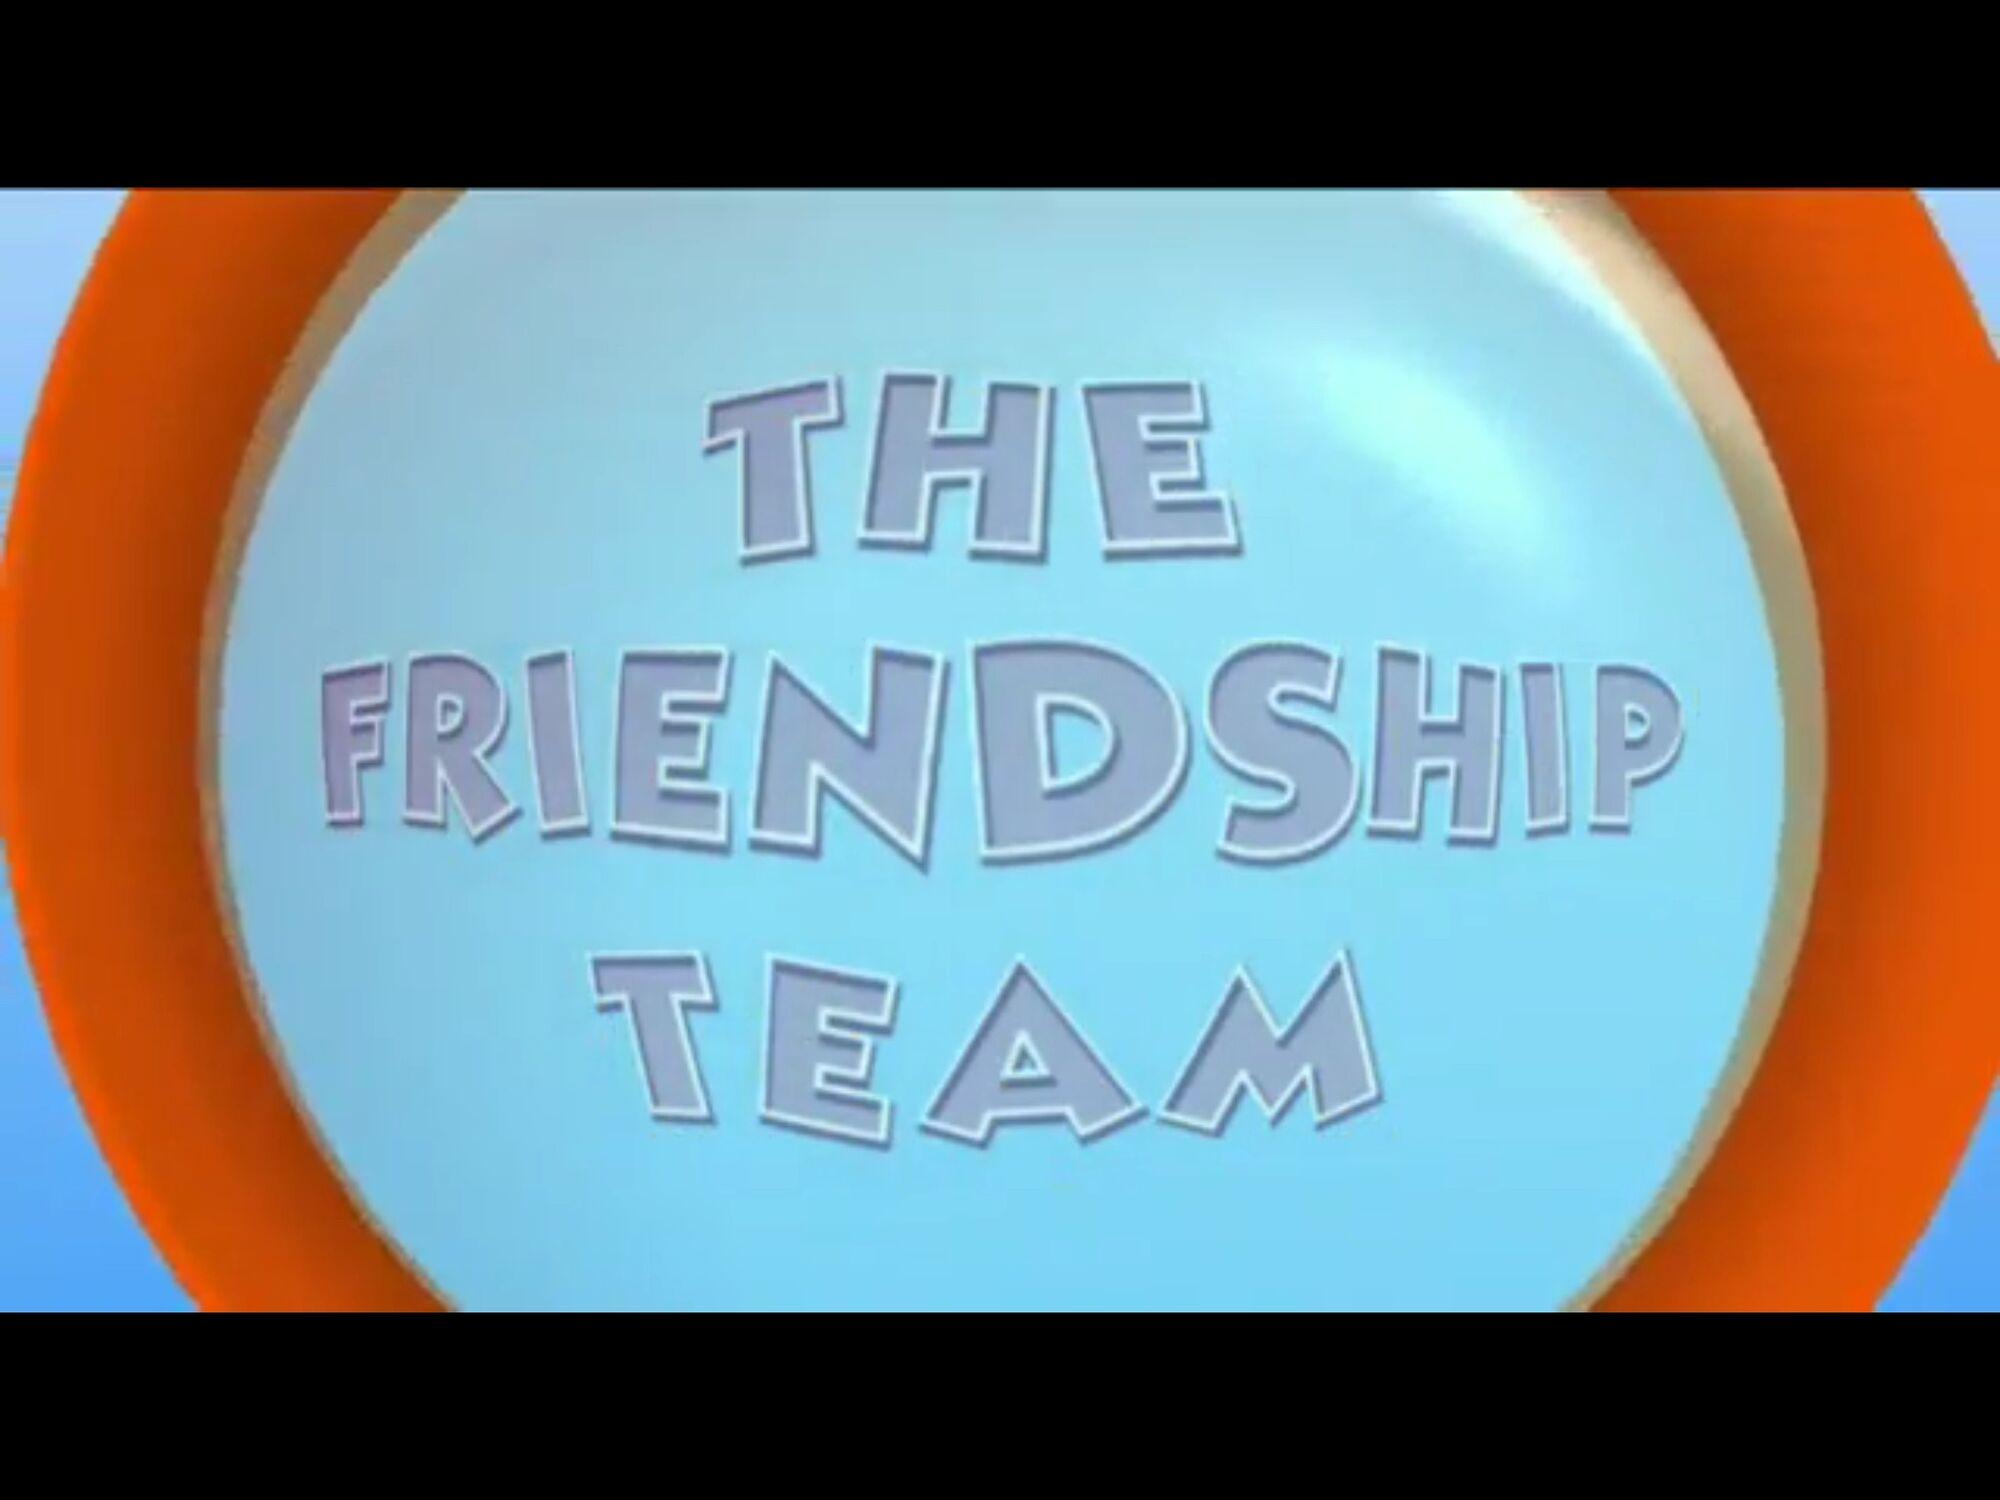 The Friendship Team